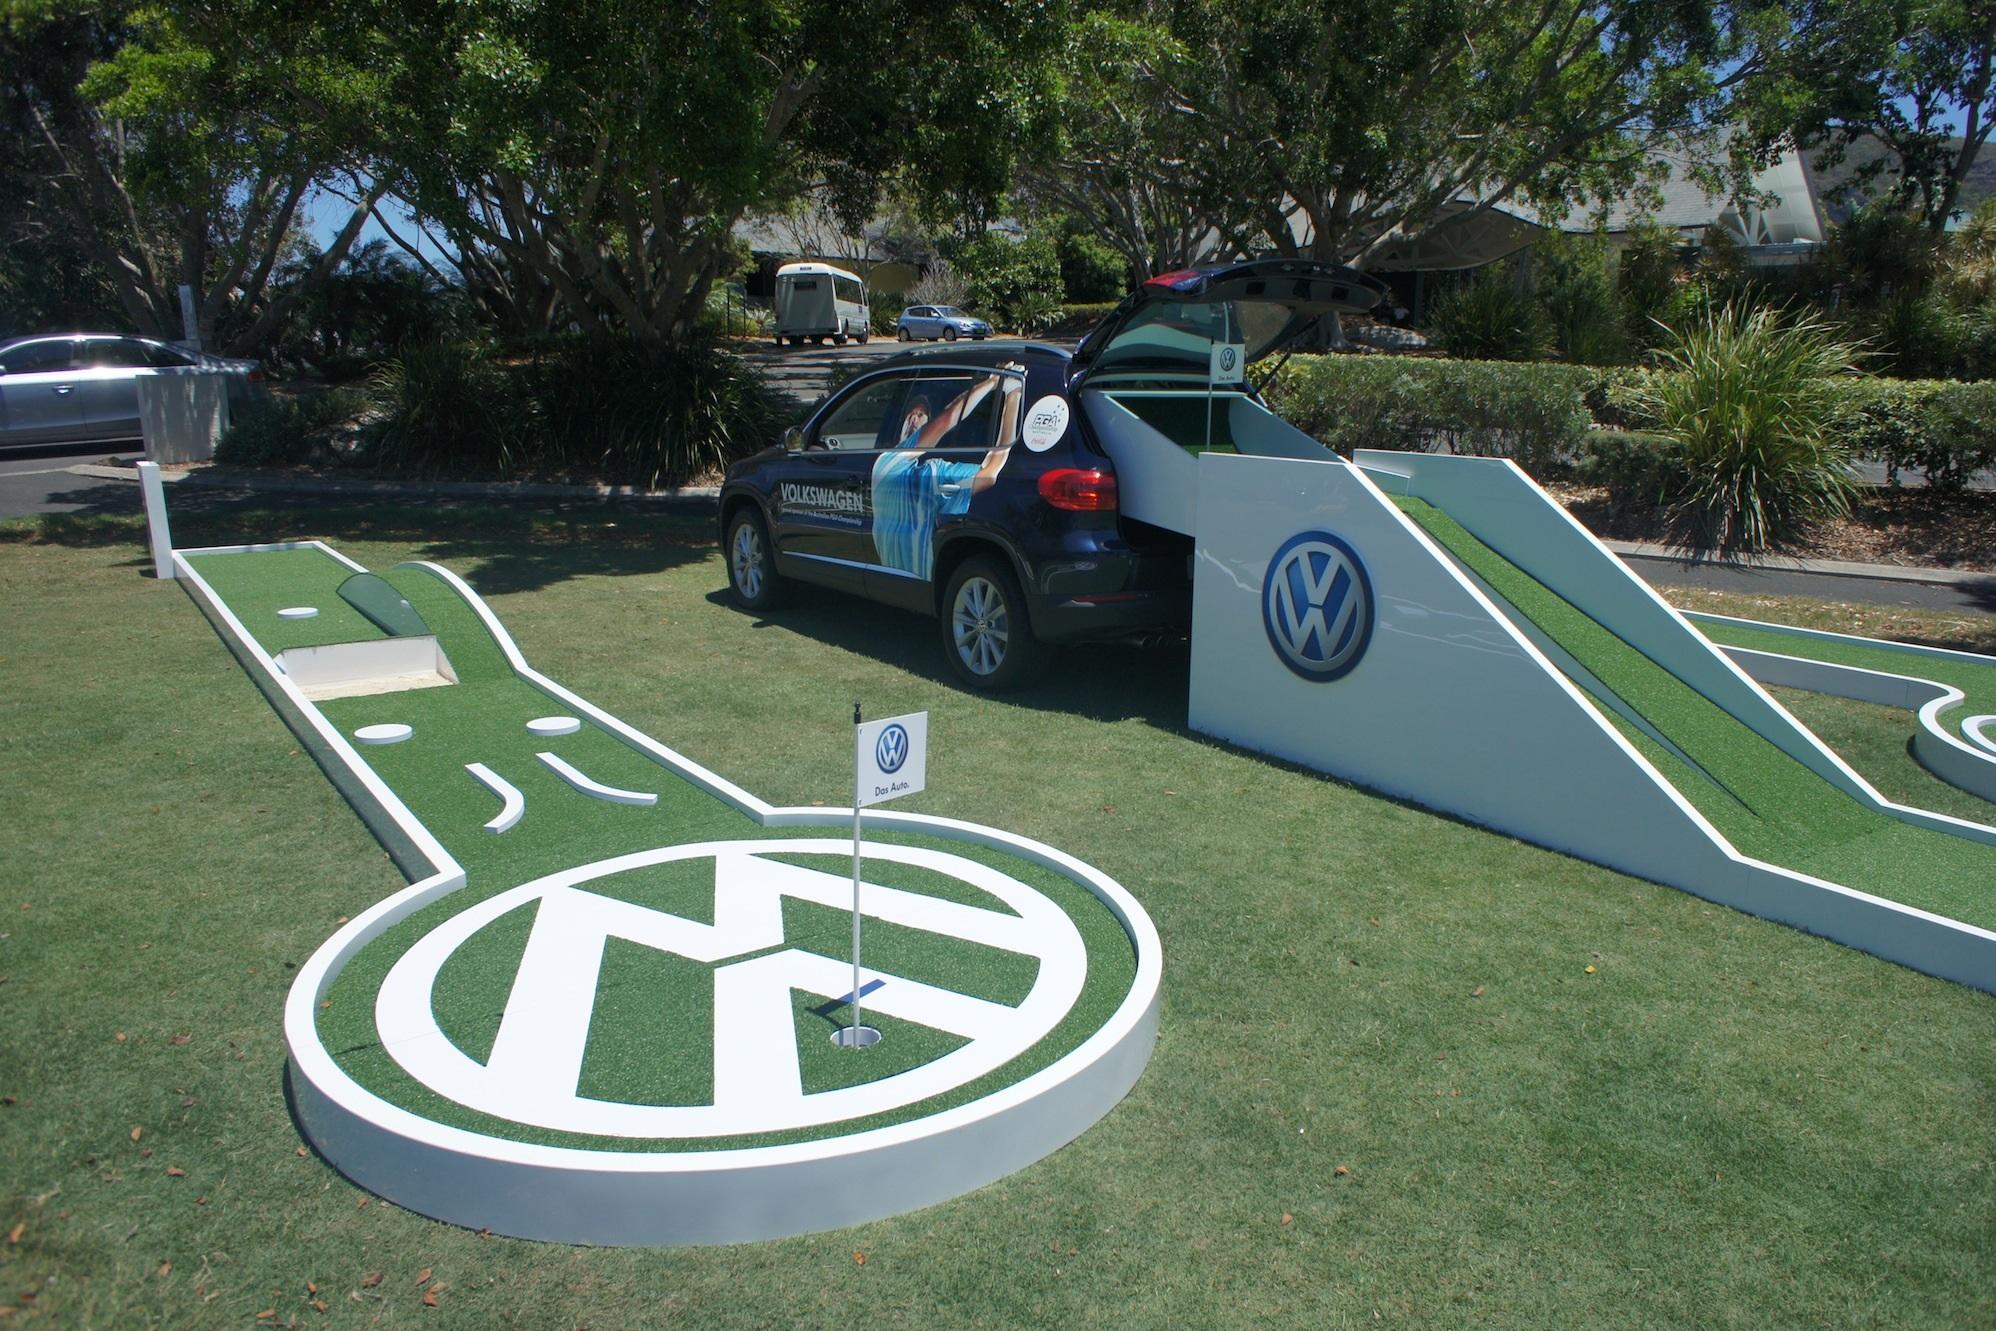 Volkswagen Golf Event at Coolum Golf Course